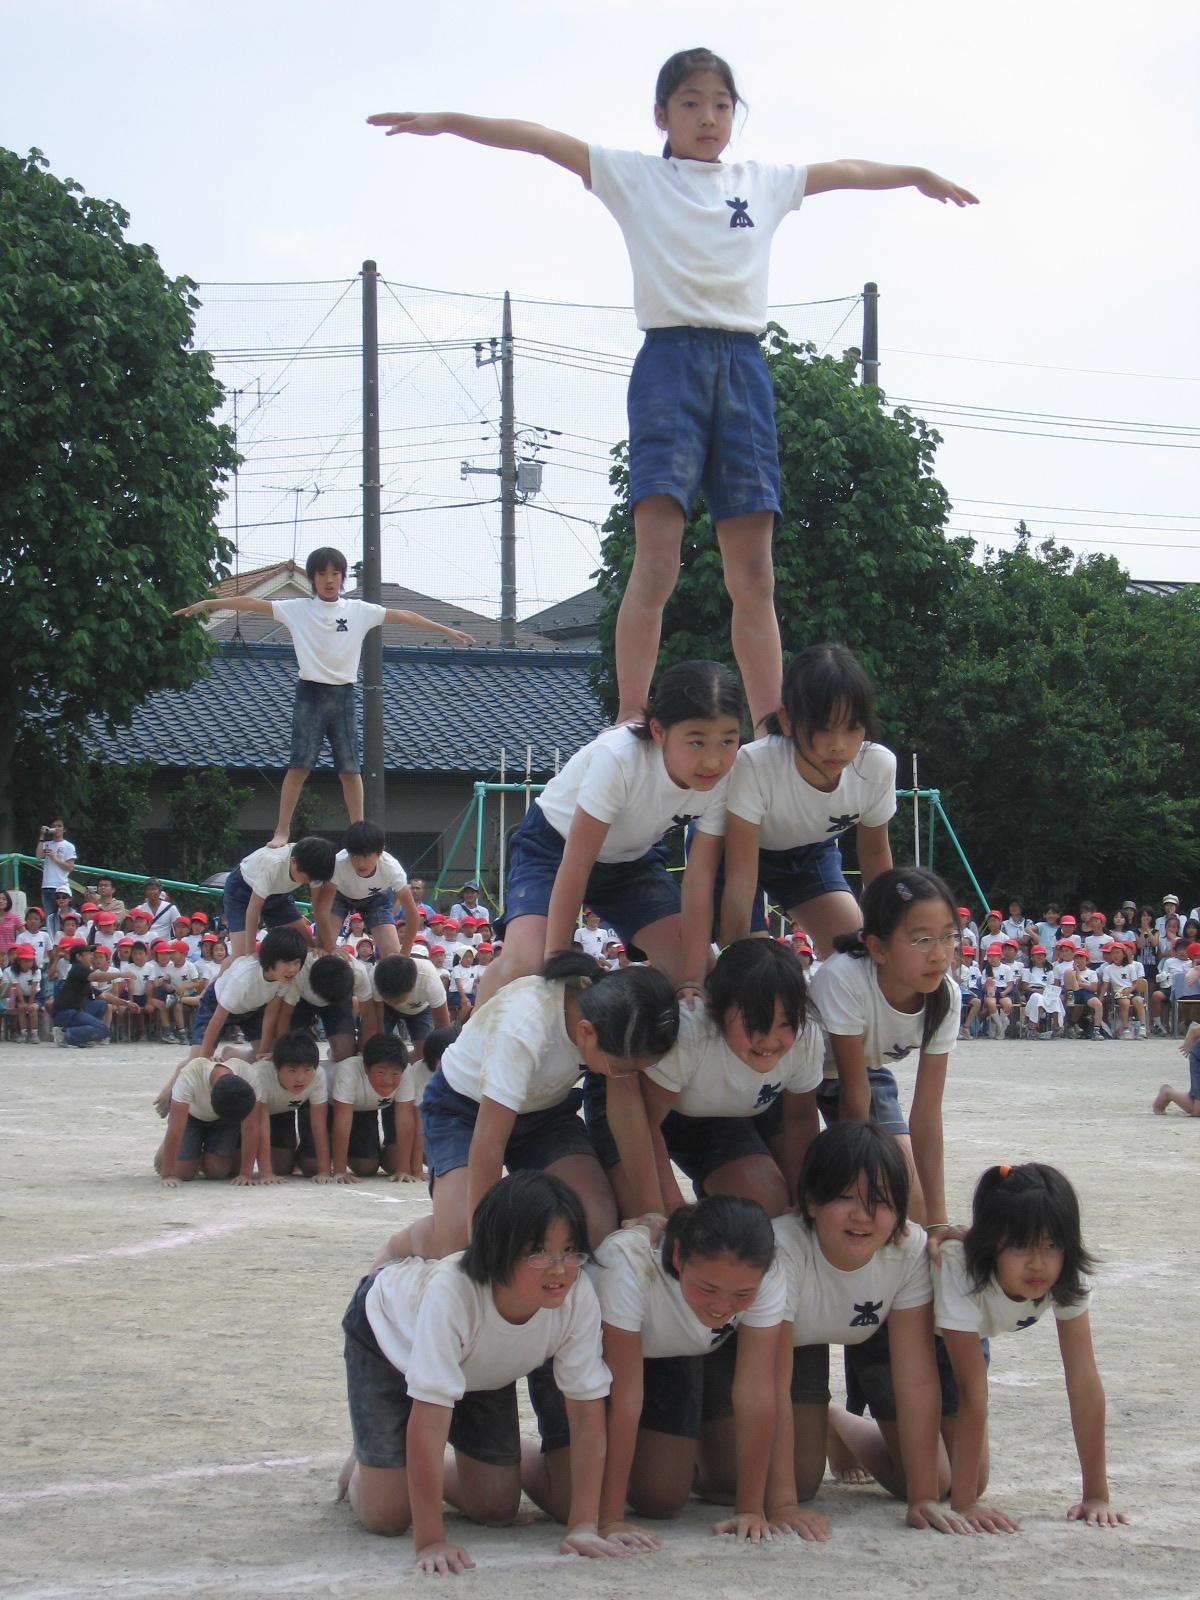 体育祭 運動会の画像YouTube動画>4本 ->画像>1118枚